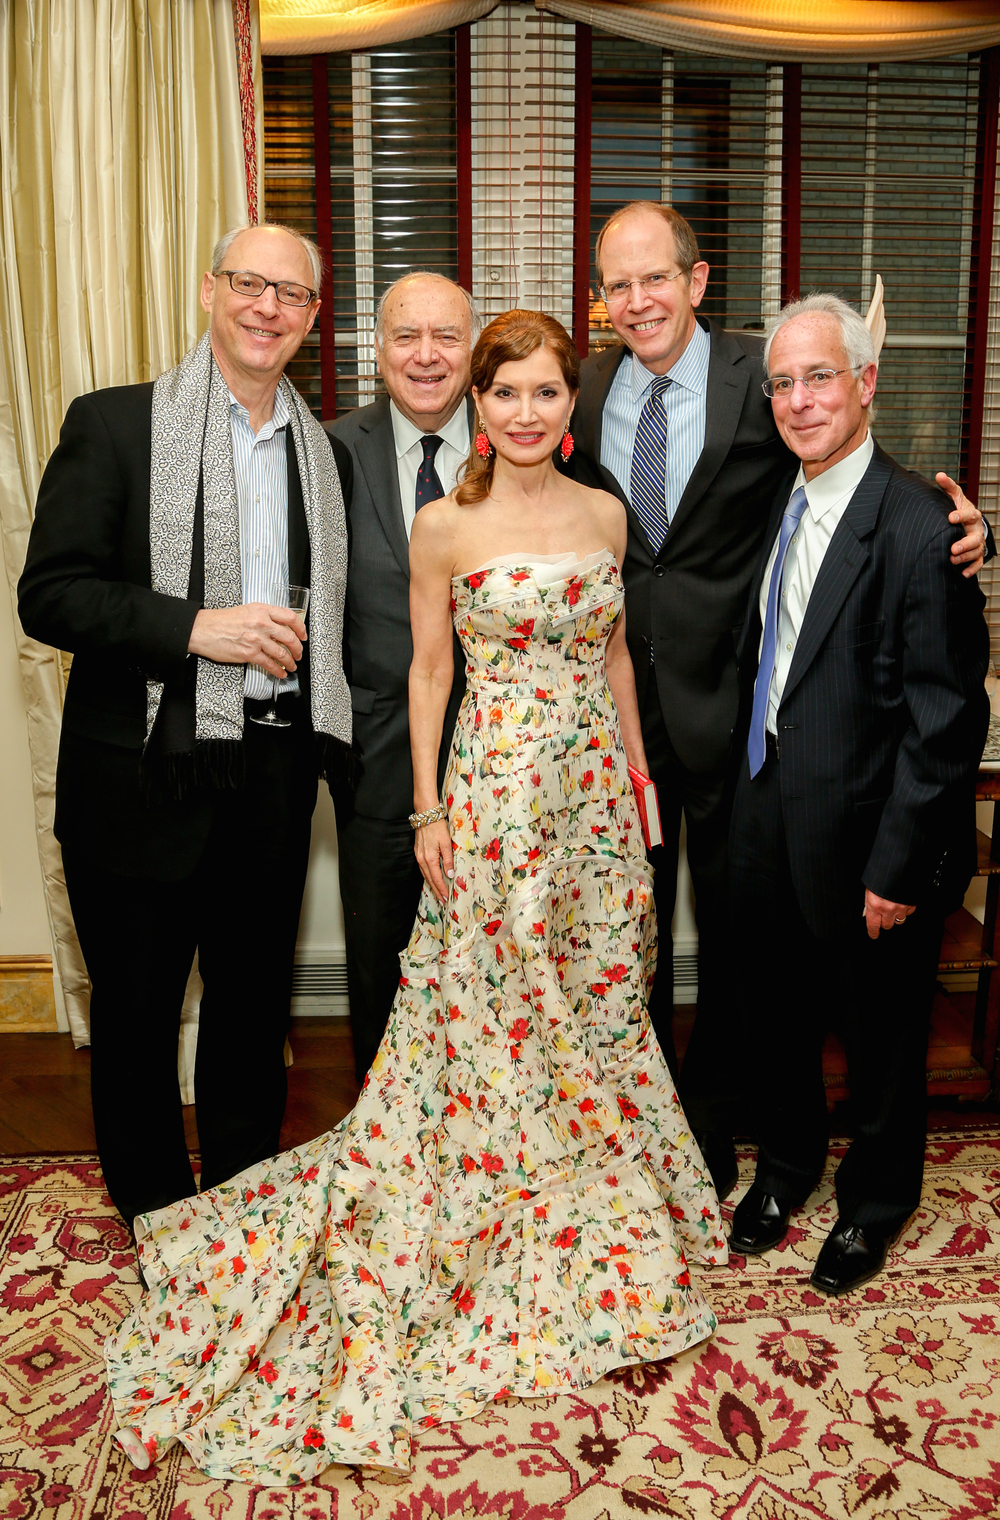 Carl Kempner, Martin Shafiroff, Jean Shafiroff, Bob Chaloner,  Steve Bernstein (Image: J Grassi/Patrick McMullan)